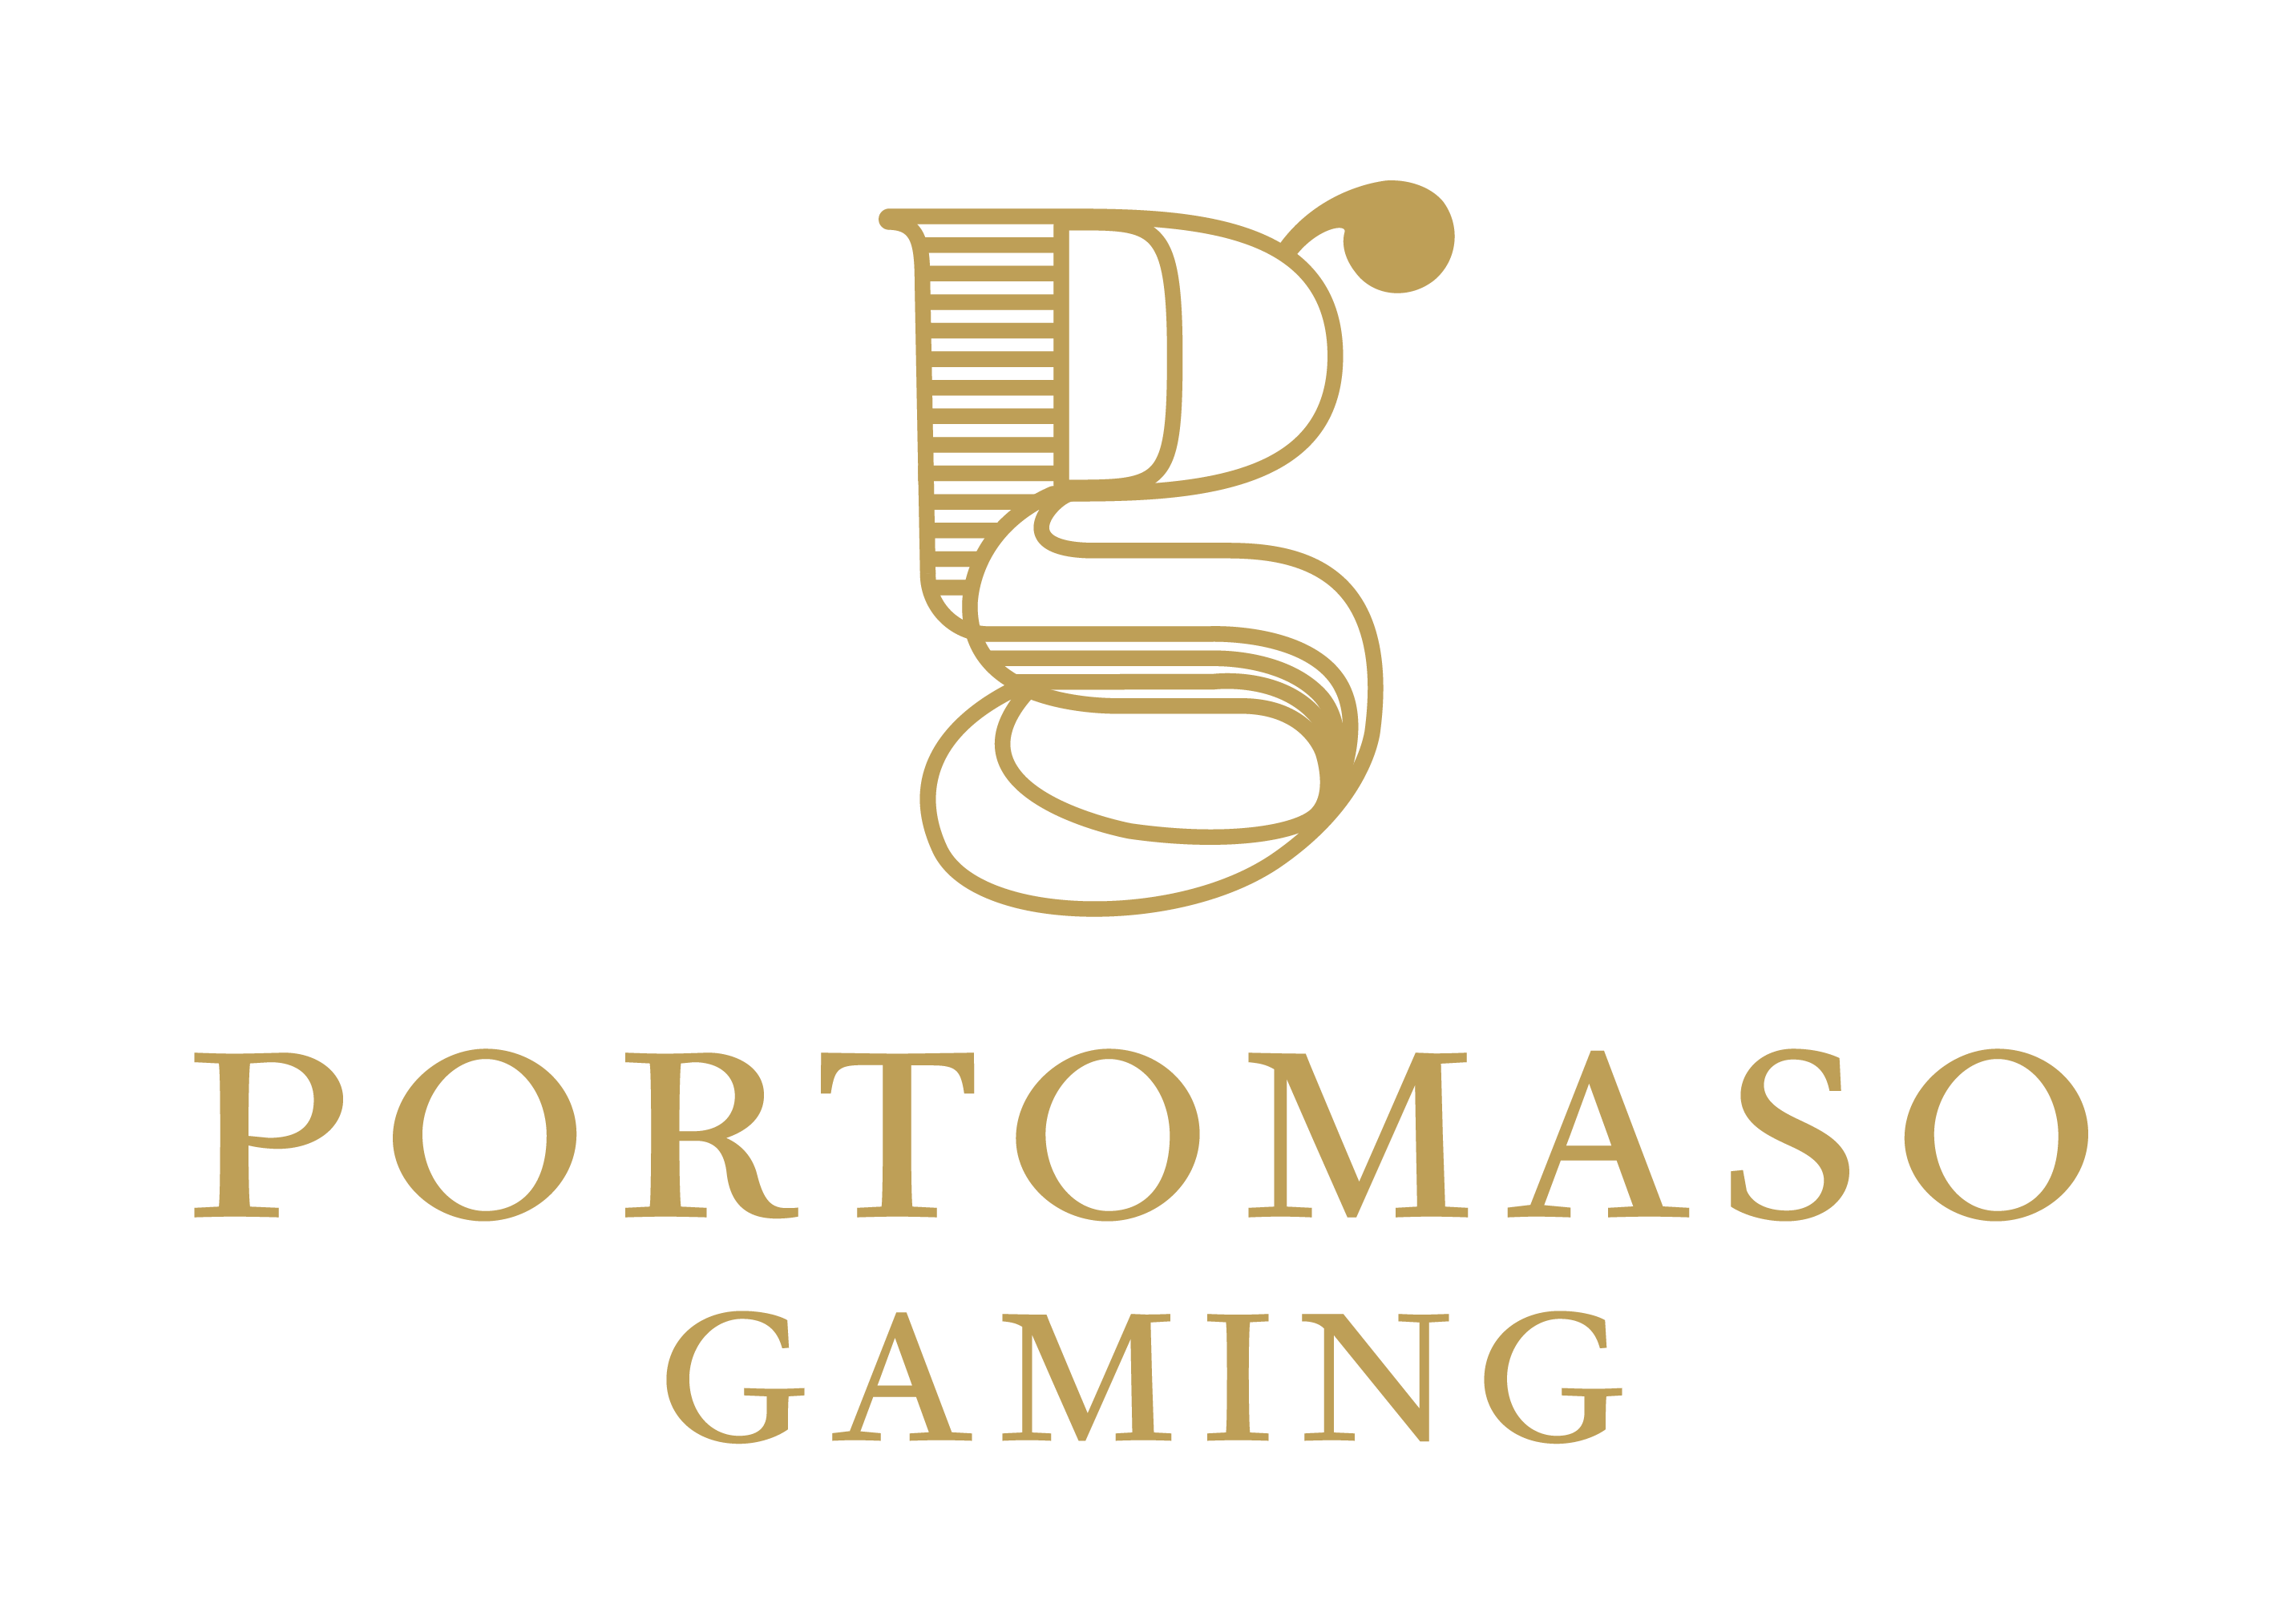 Portomaso Gaming juegos